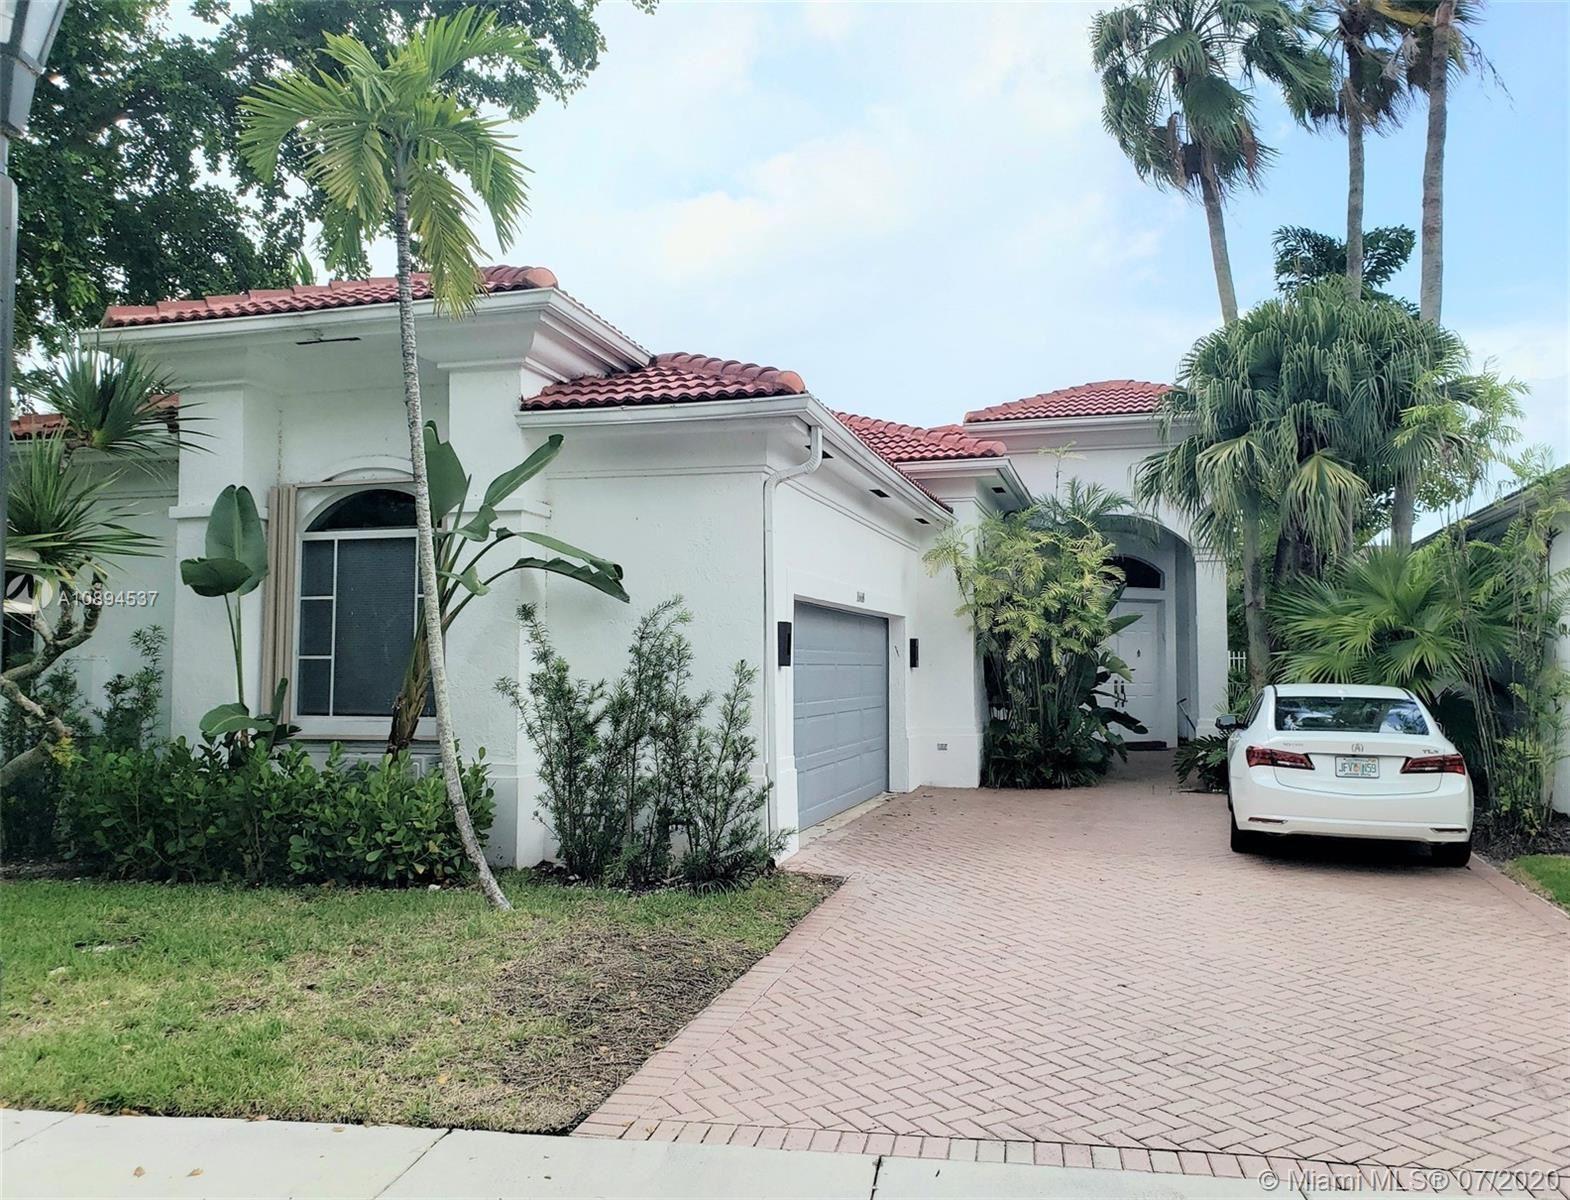 1668 Diplomat Dr, Miami, FL 33179 - #: A10894537